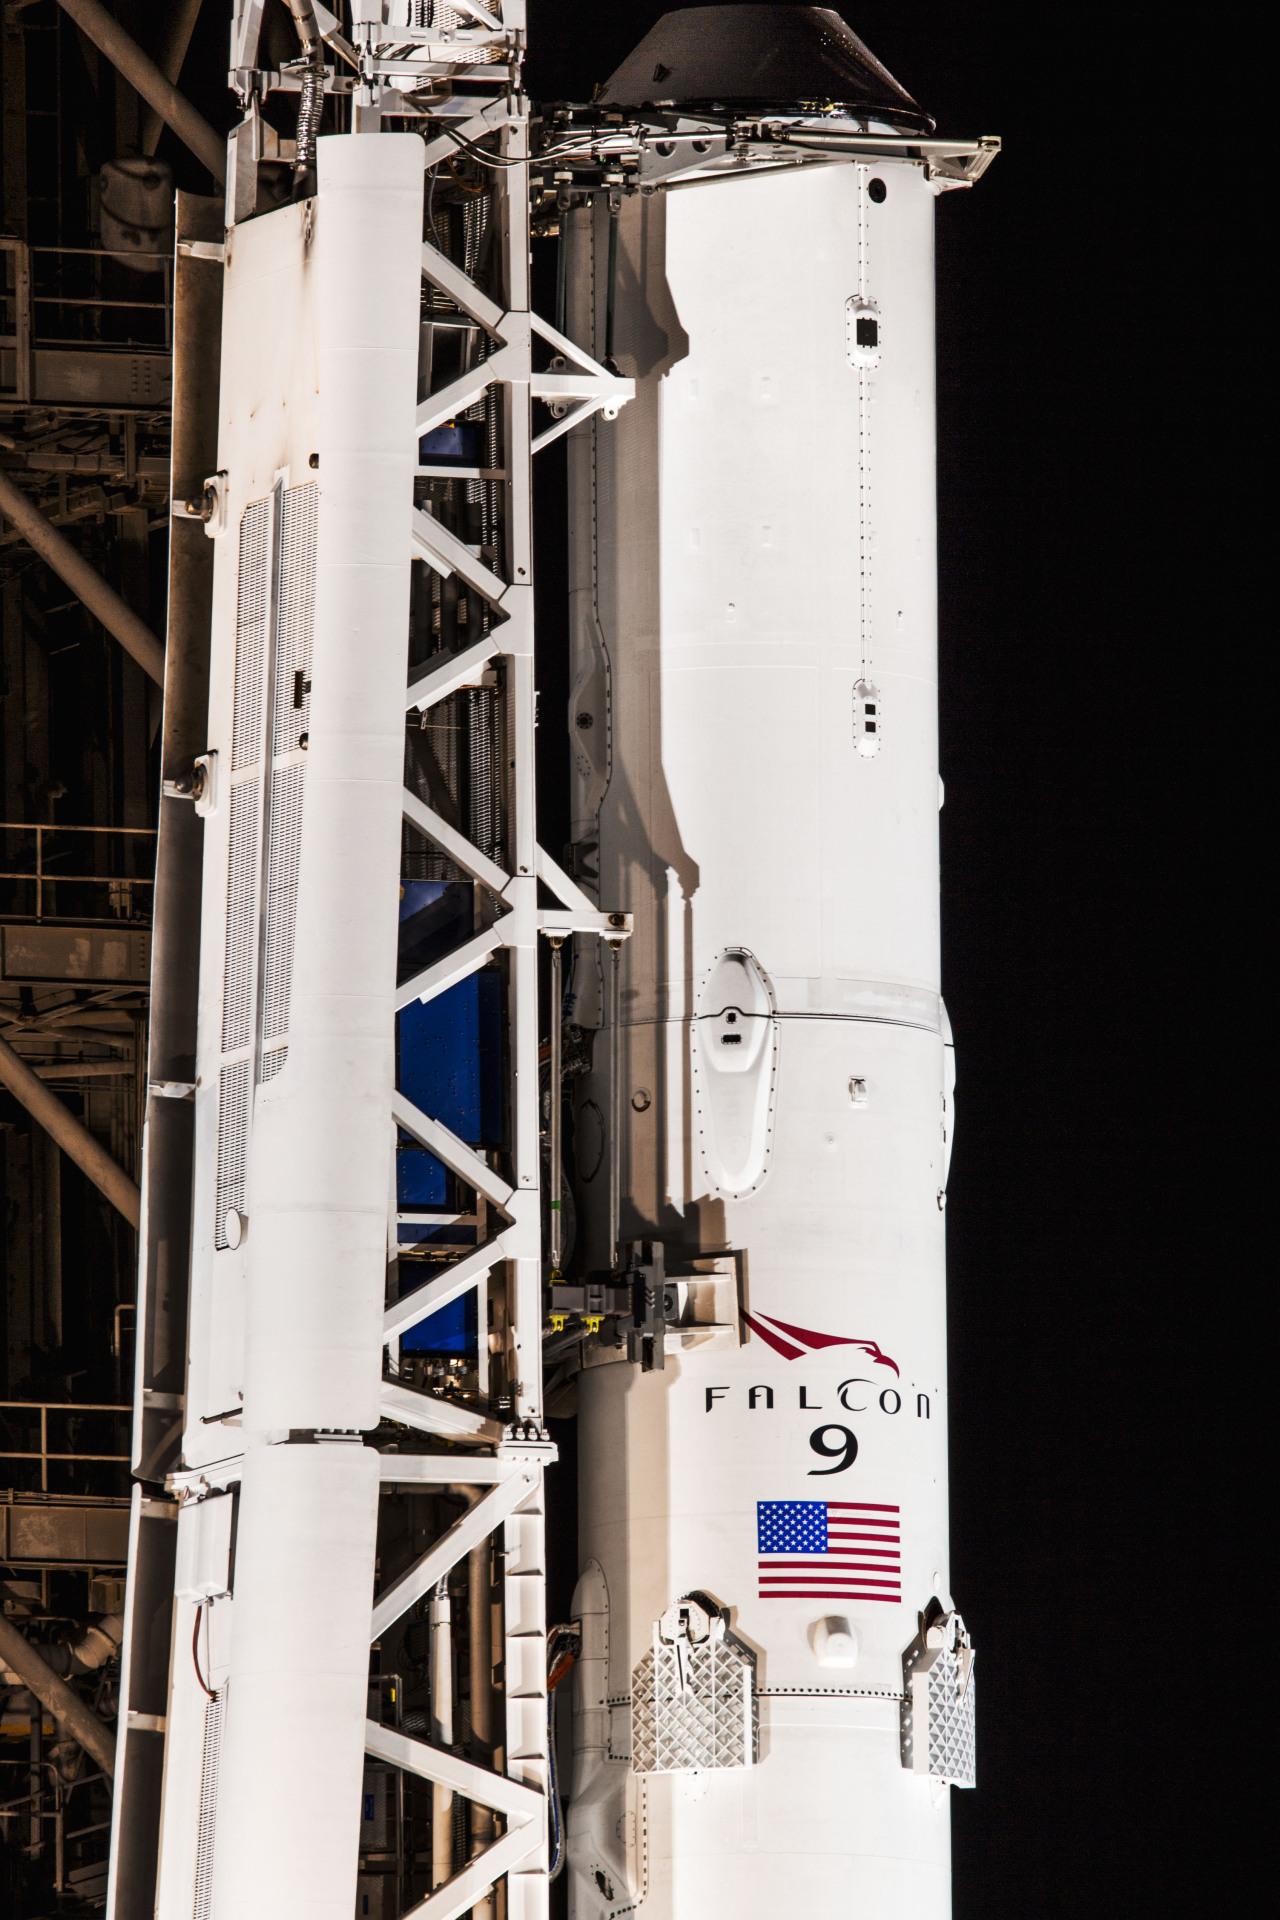 Falcon-9 (CRS-10) - 19.02.17  [Succès] - Page 4 Tumblr_ol6ztq3RMq1ttka3go3_1280